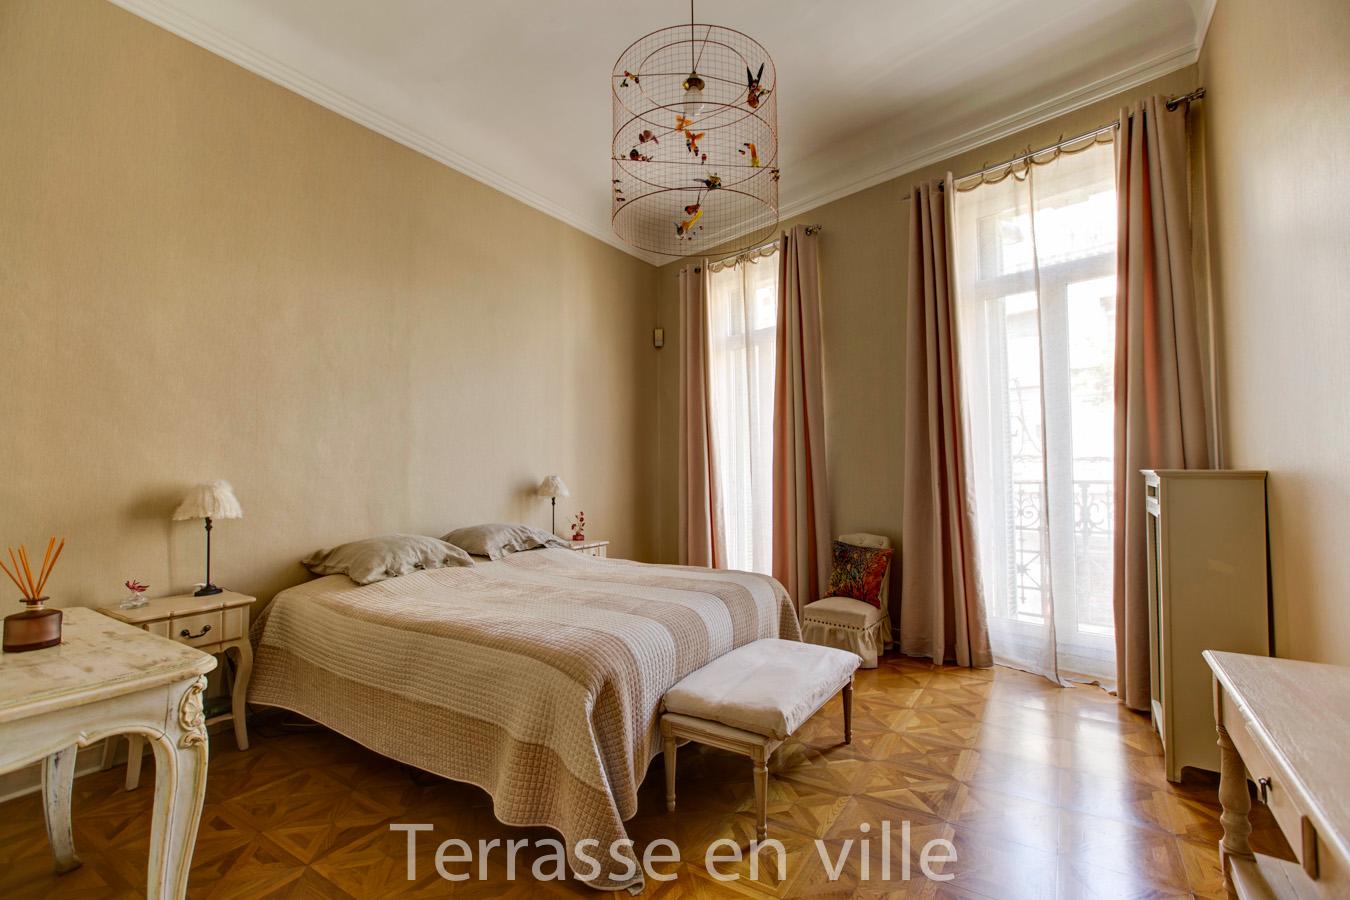 terrasse-4-1.jpg